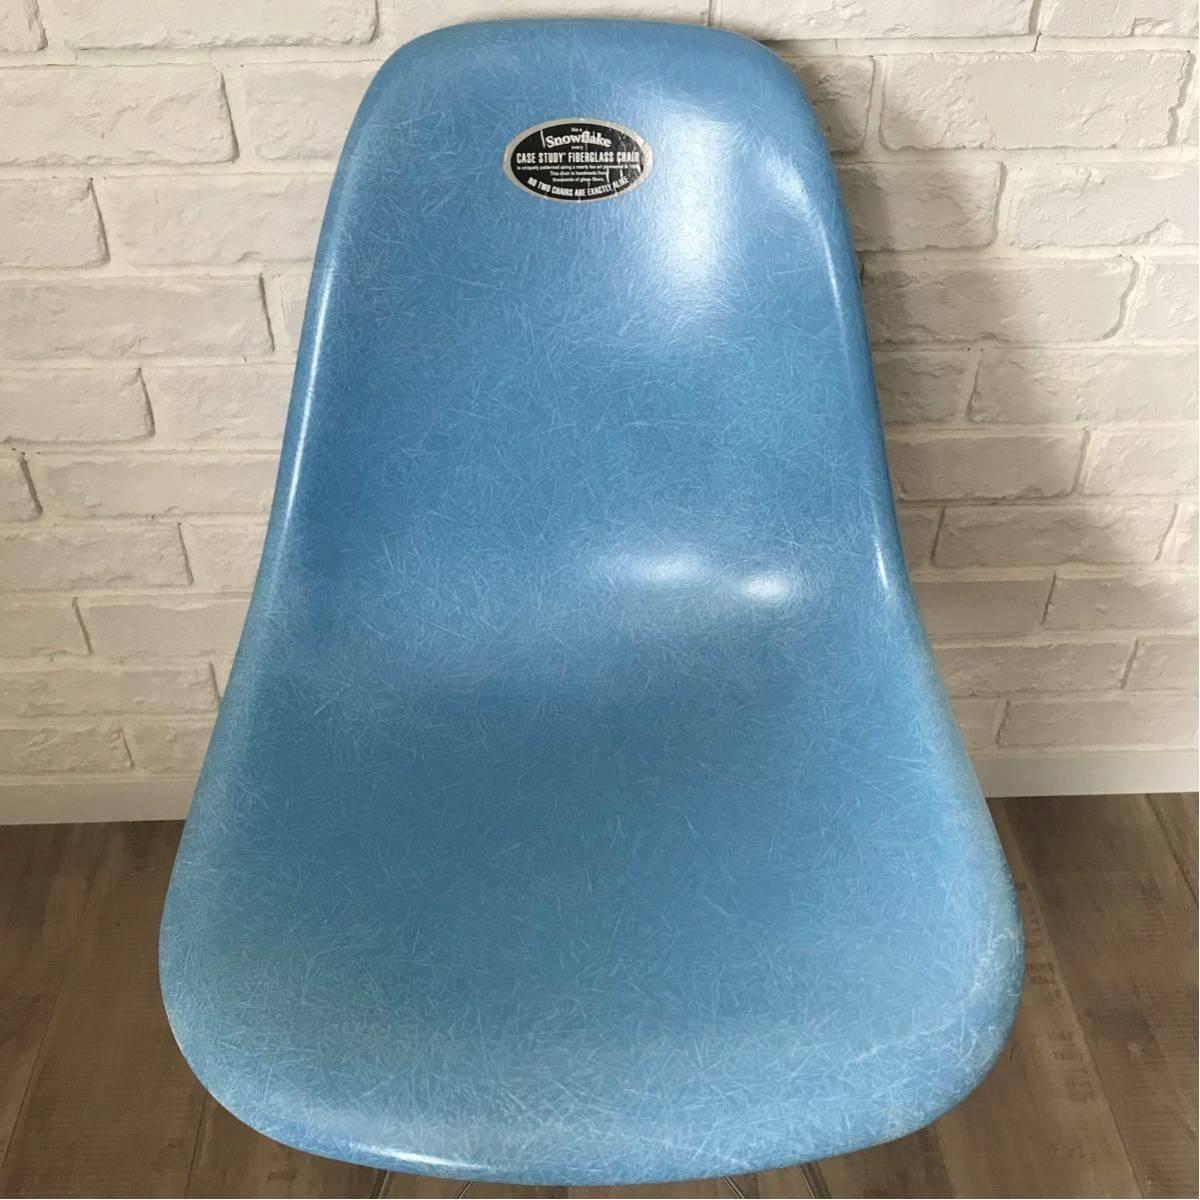 MODERNICA × BAPE CAMO SIDE CHAIR blue a bathing ape EAMES モダニカ イームズ チェア ABC CAMO ABCカモ エイプ ベイプ 椅子 カリモク